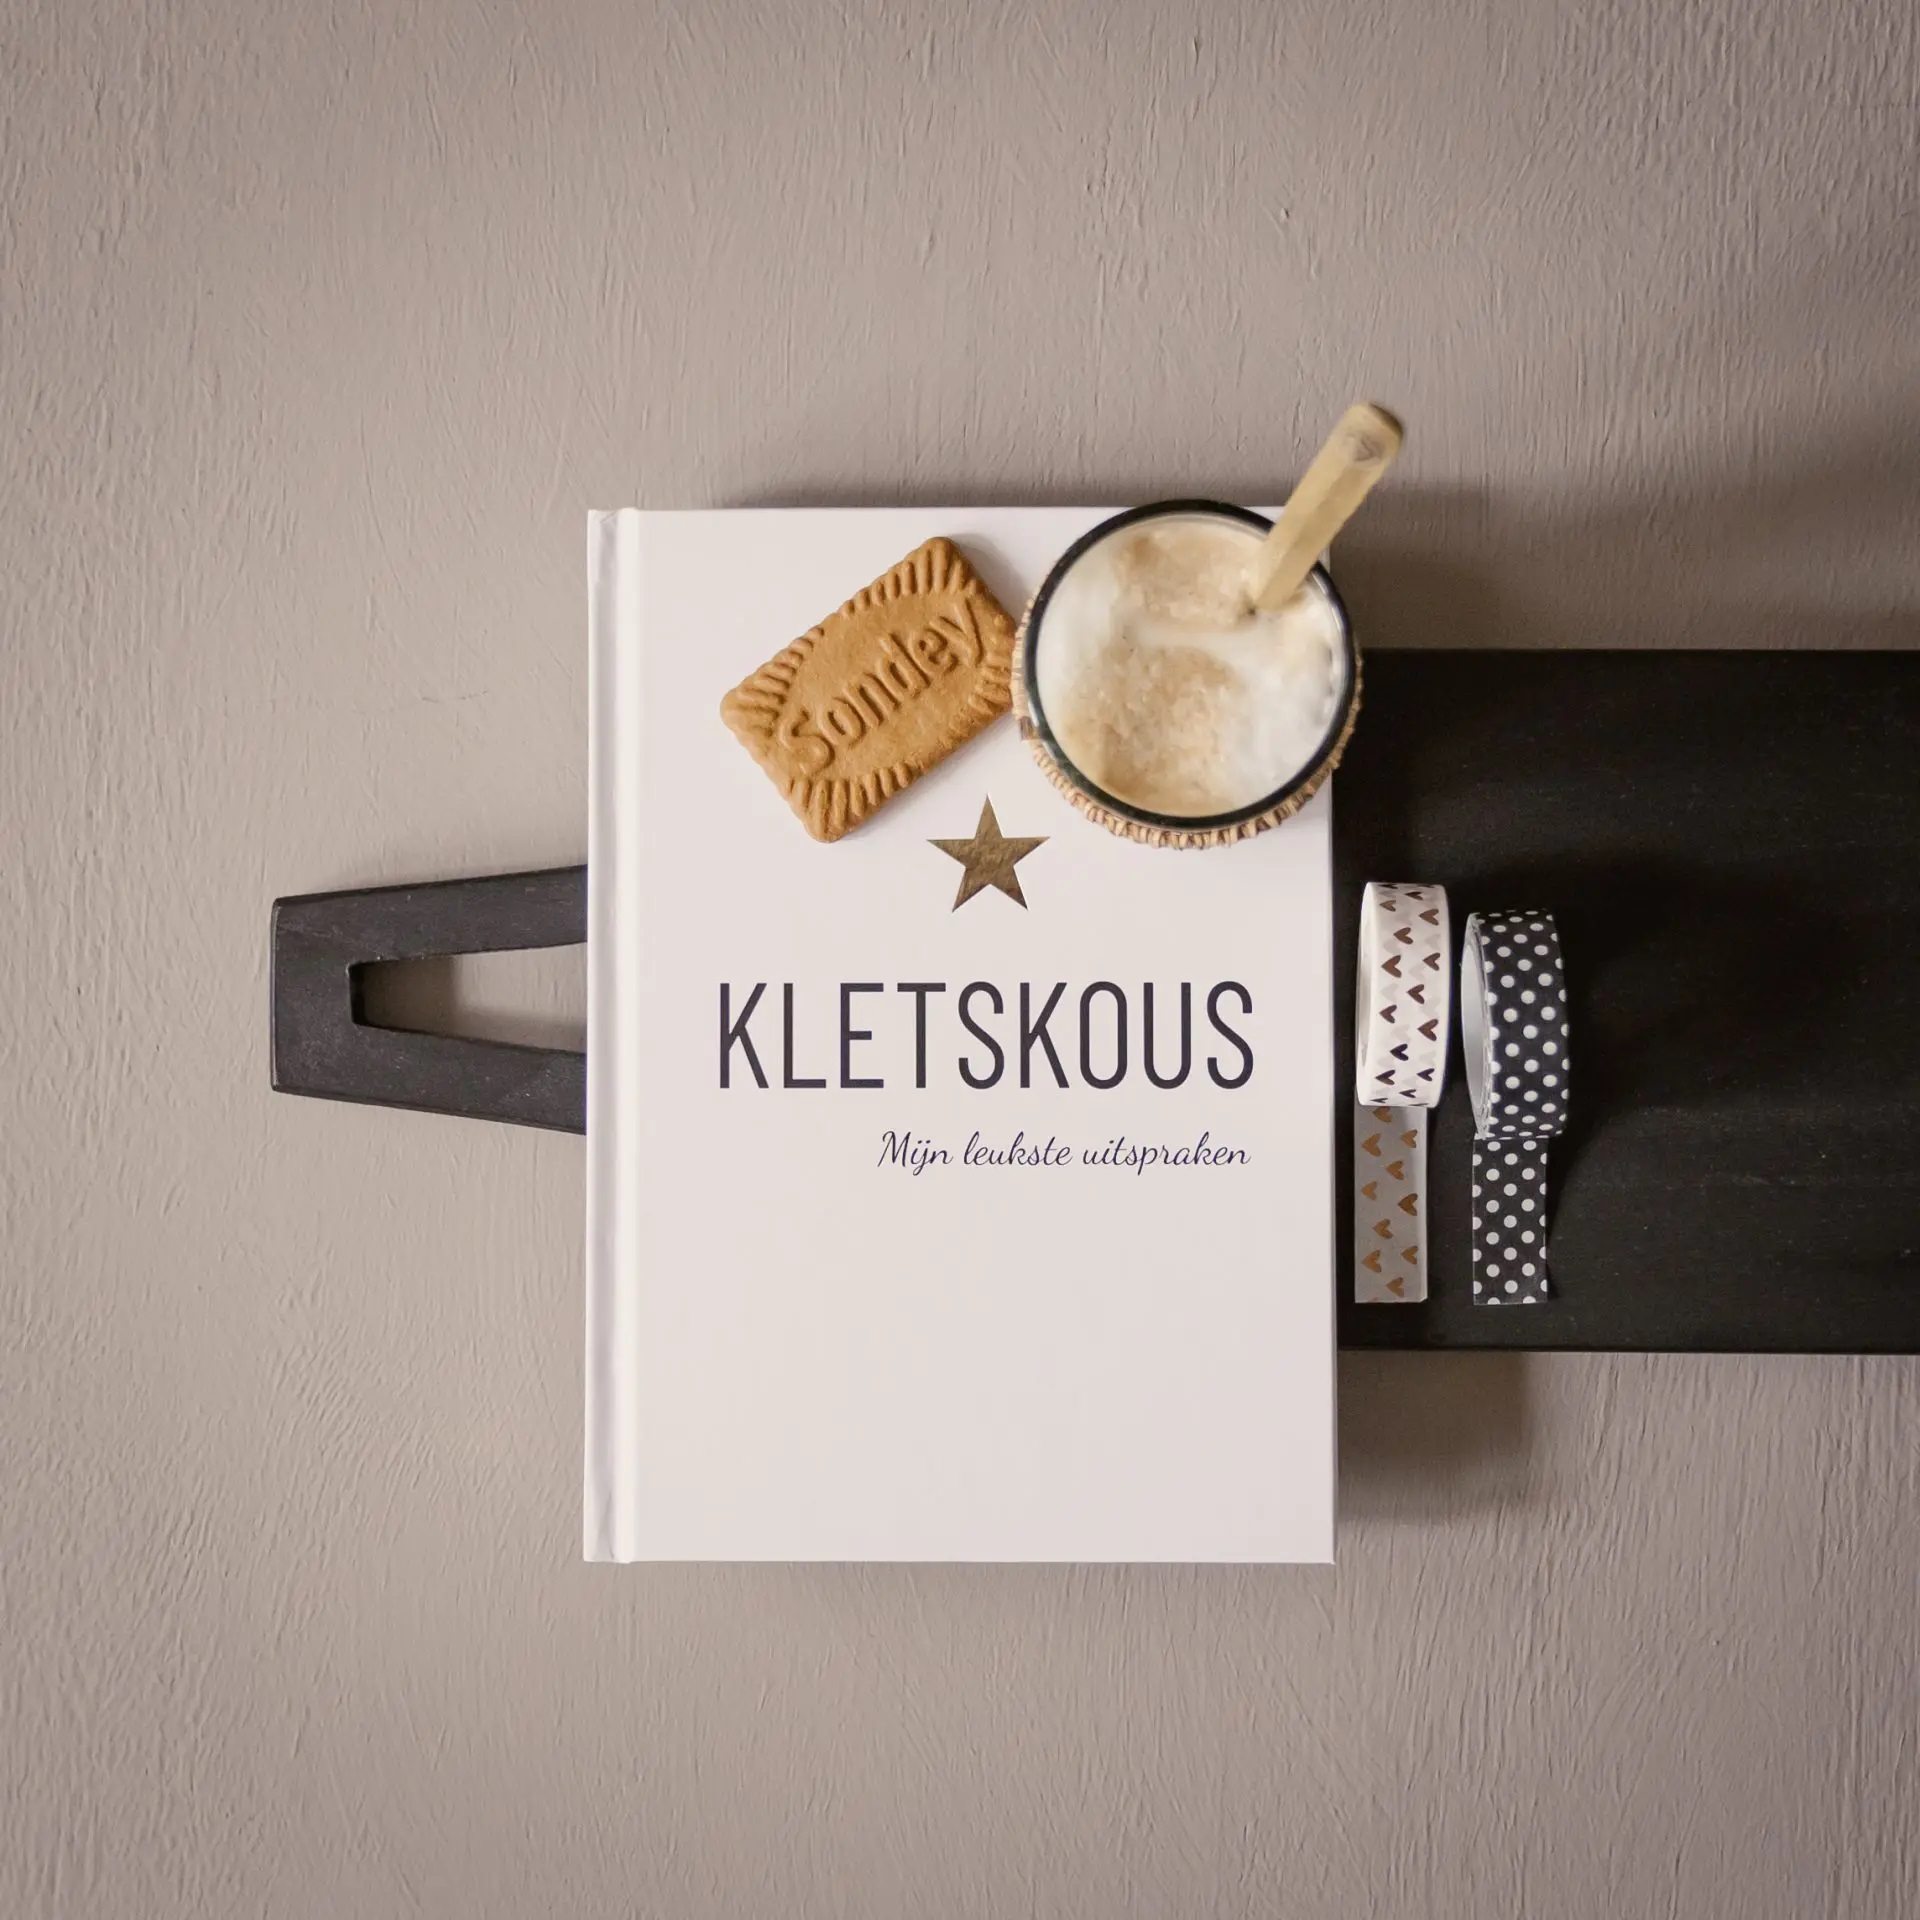 Kletskous uitsprakenboekje 5